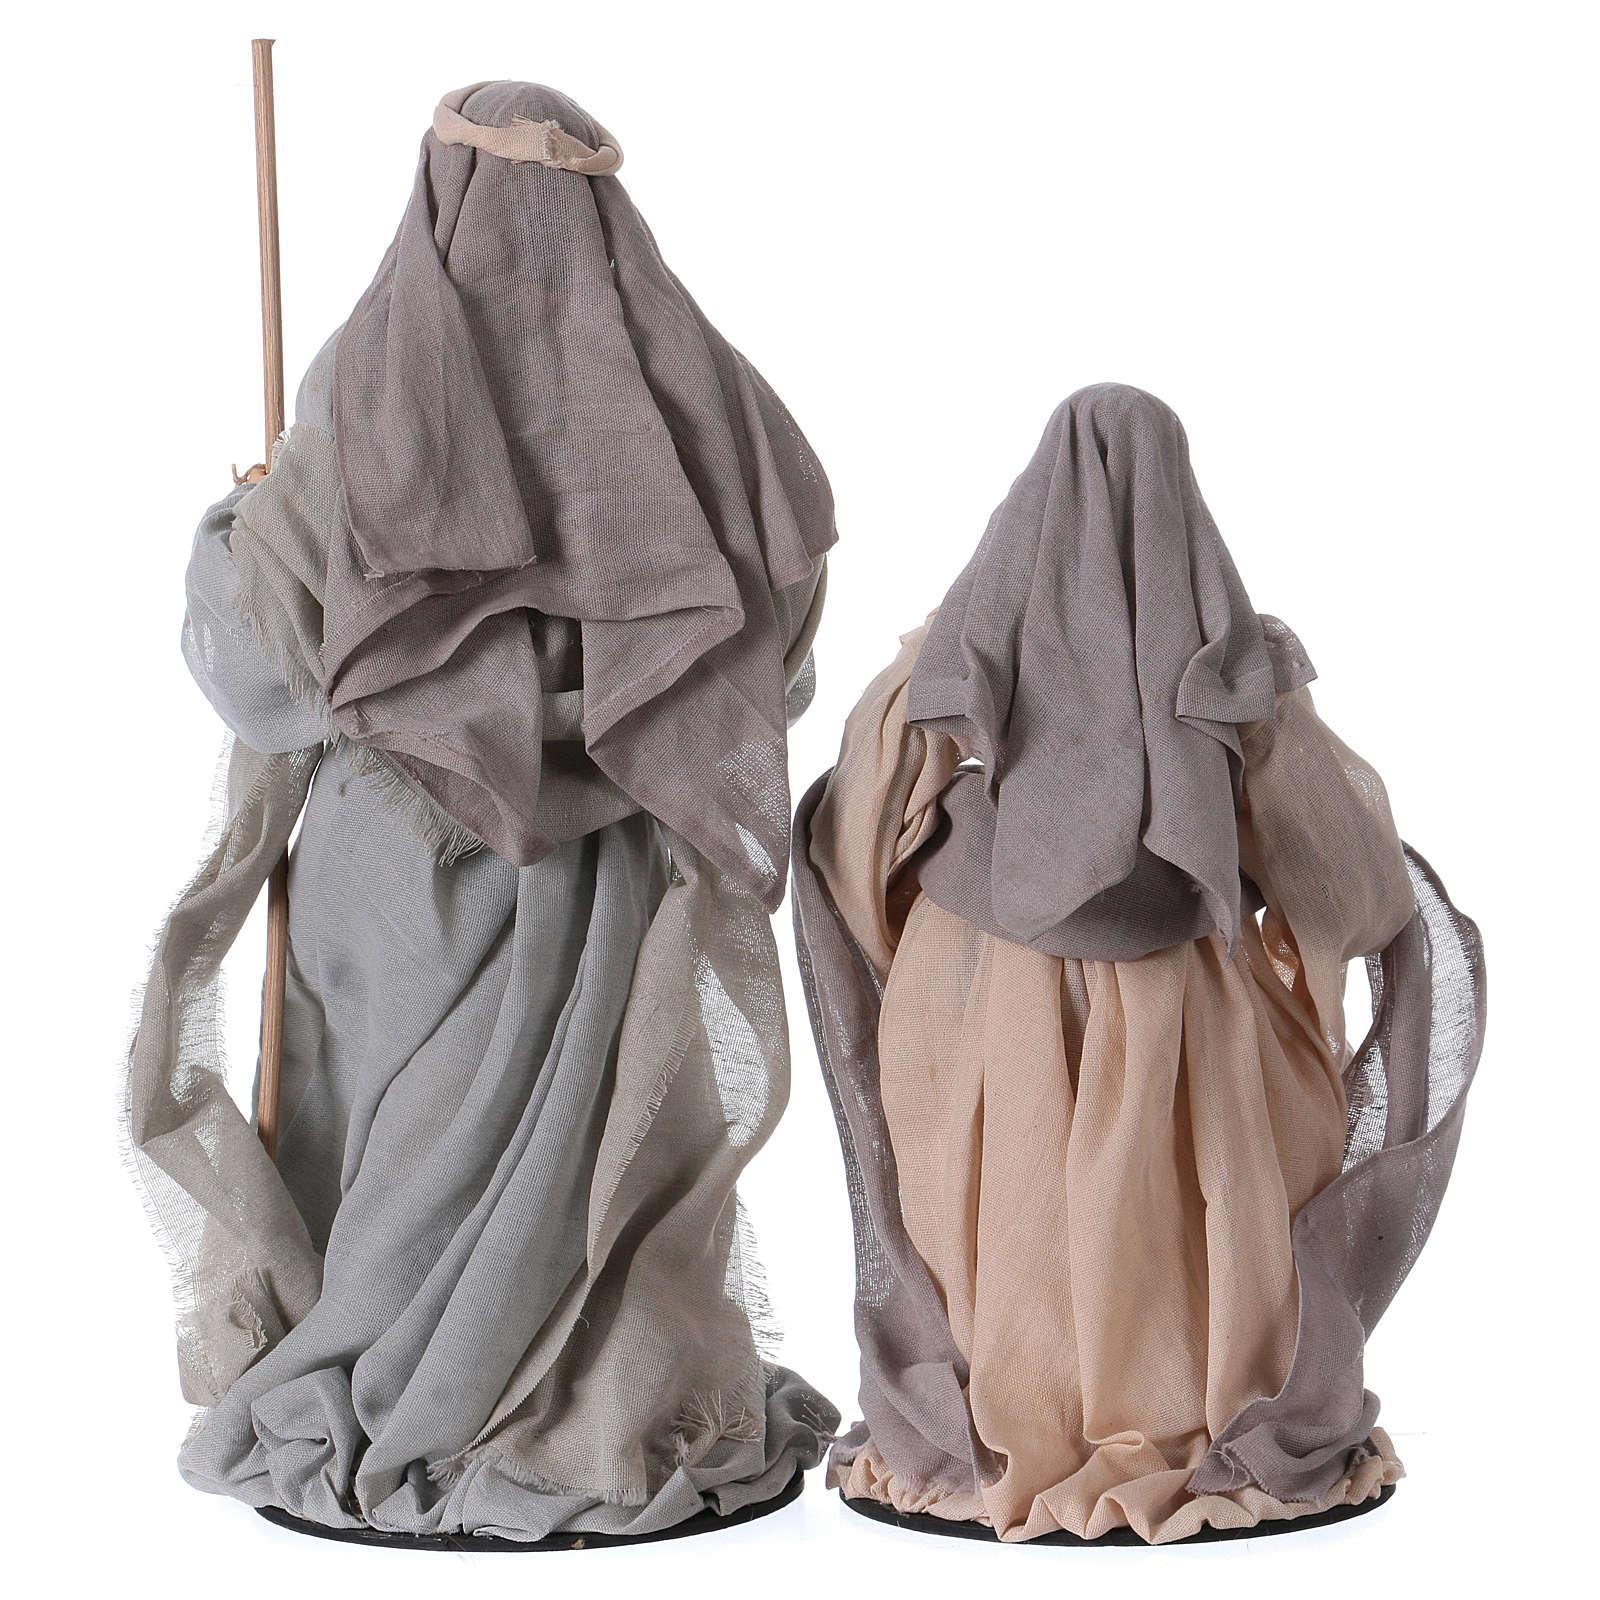 Natività e re magi 46 cm resina tessuto viola grigio 3